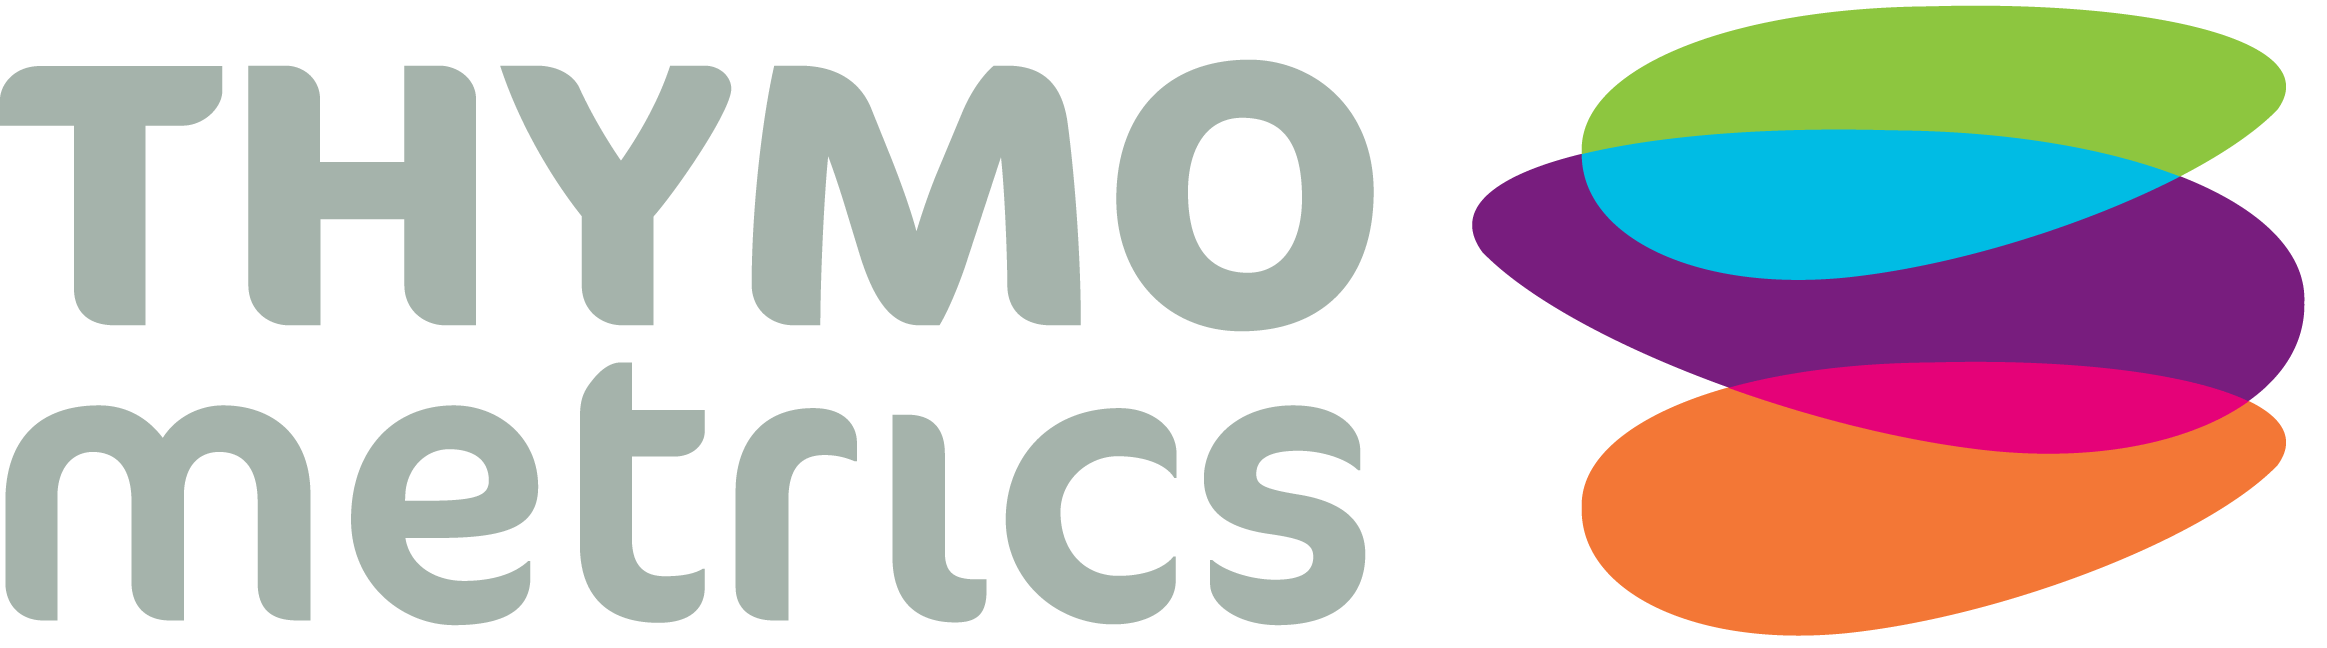 Thymometrics logo